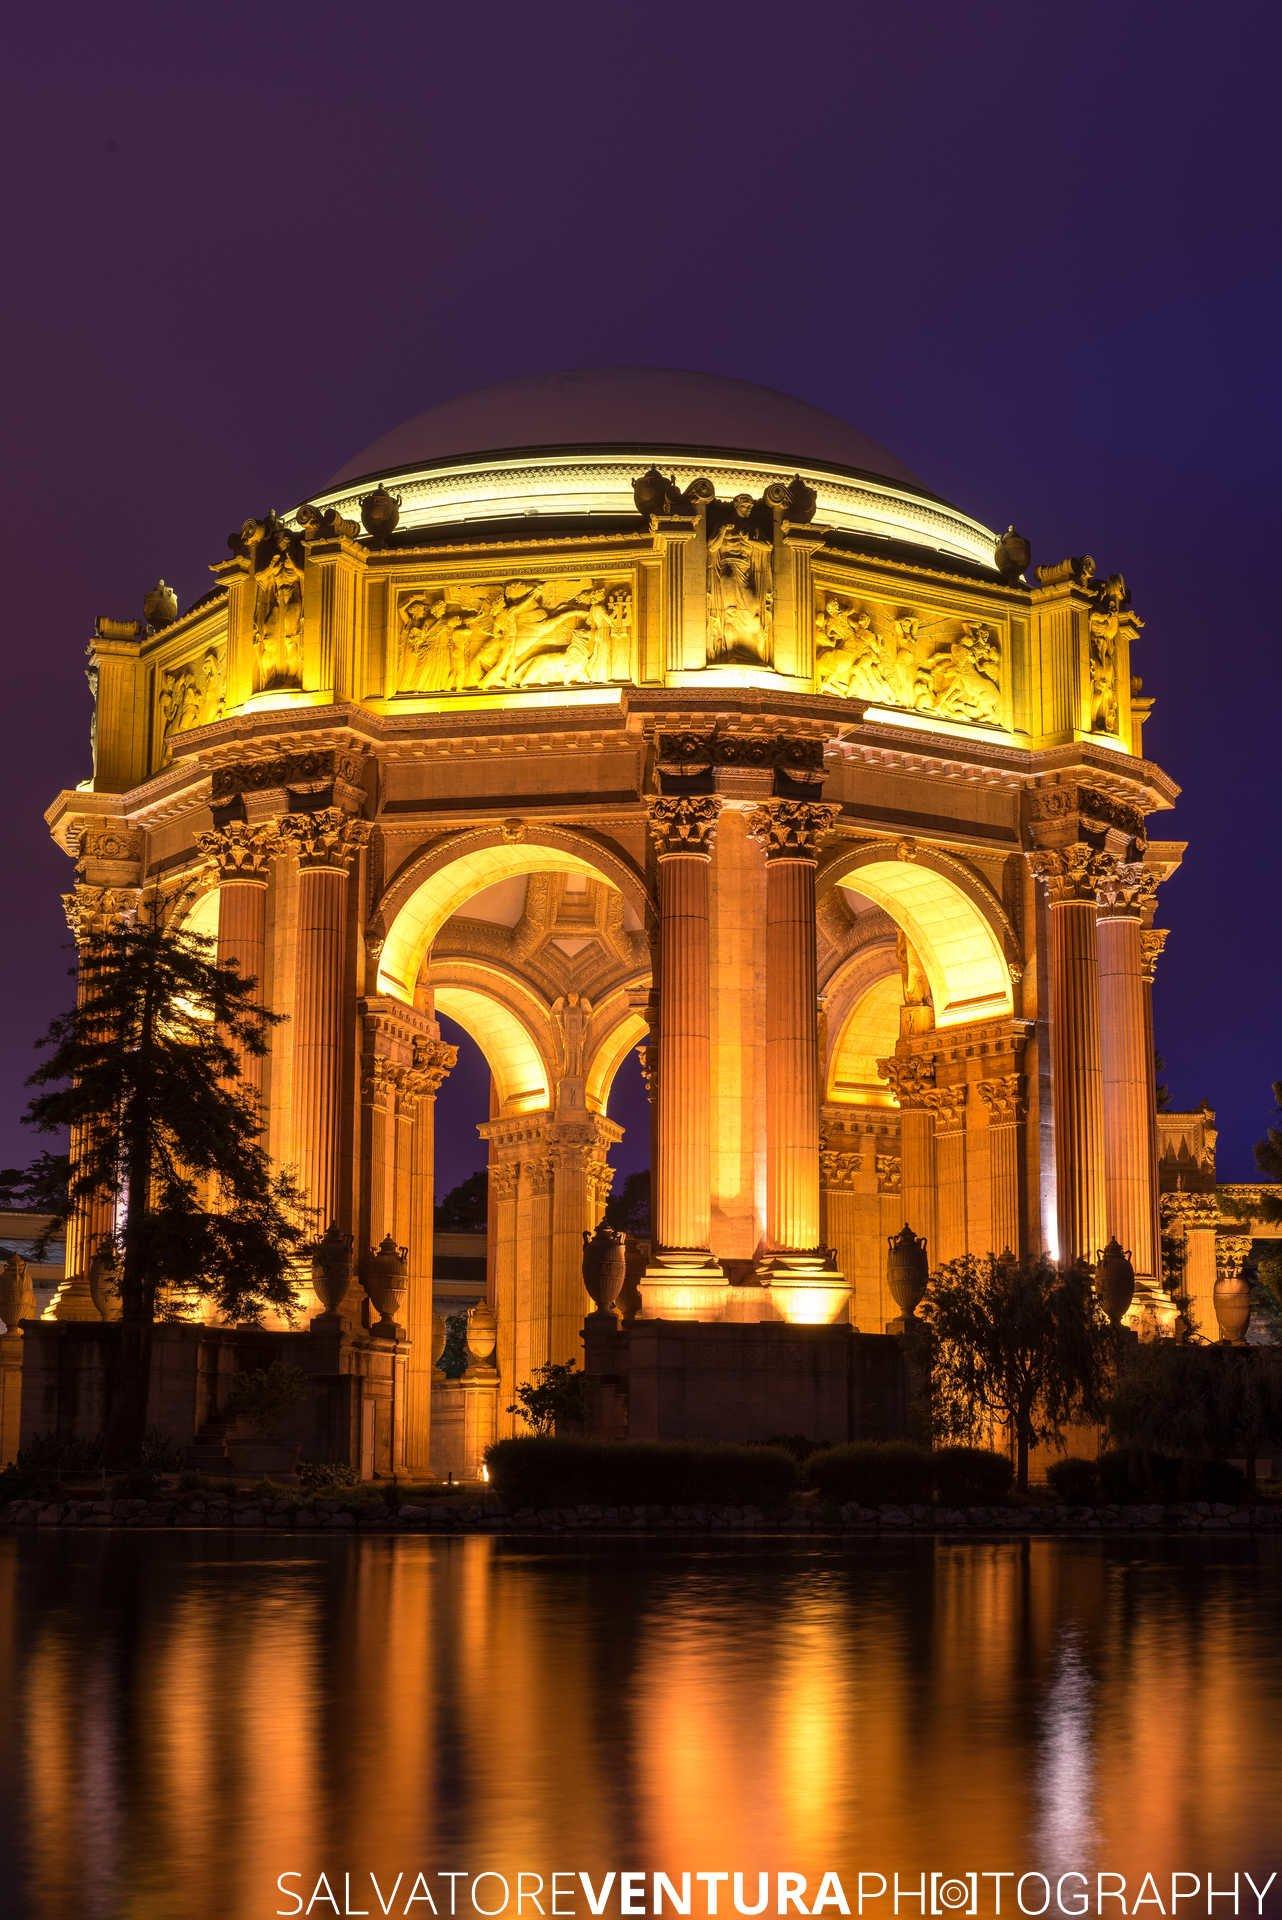 Palace of Fine Art, San Francisco (night photograph/long exposure) - Salvatore Ventura Ph[o]tography